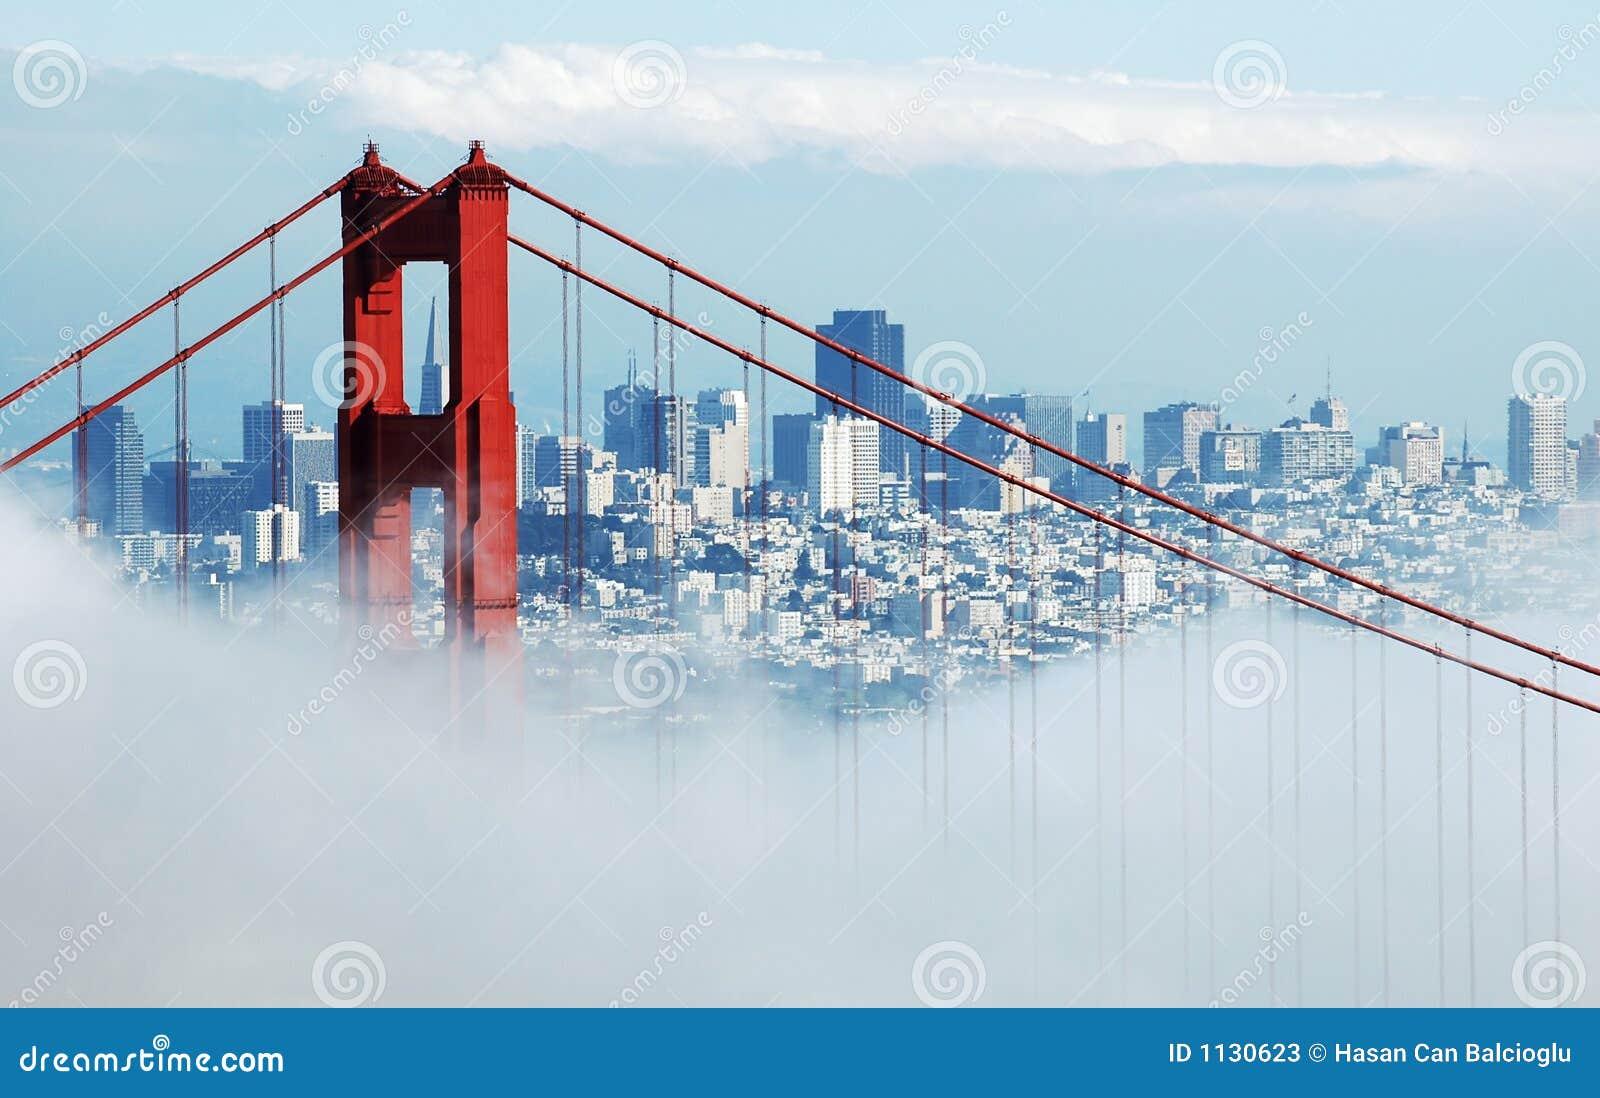 Golden Gate Bridge & San Francisco under fog